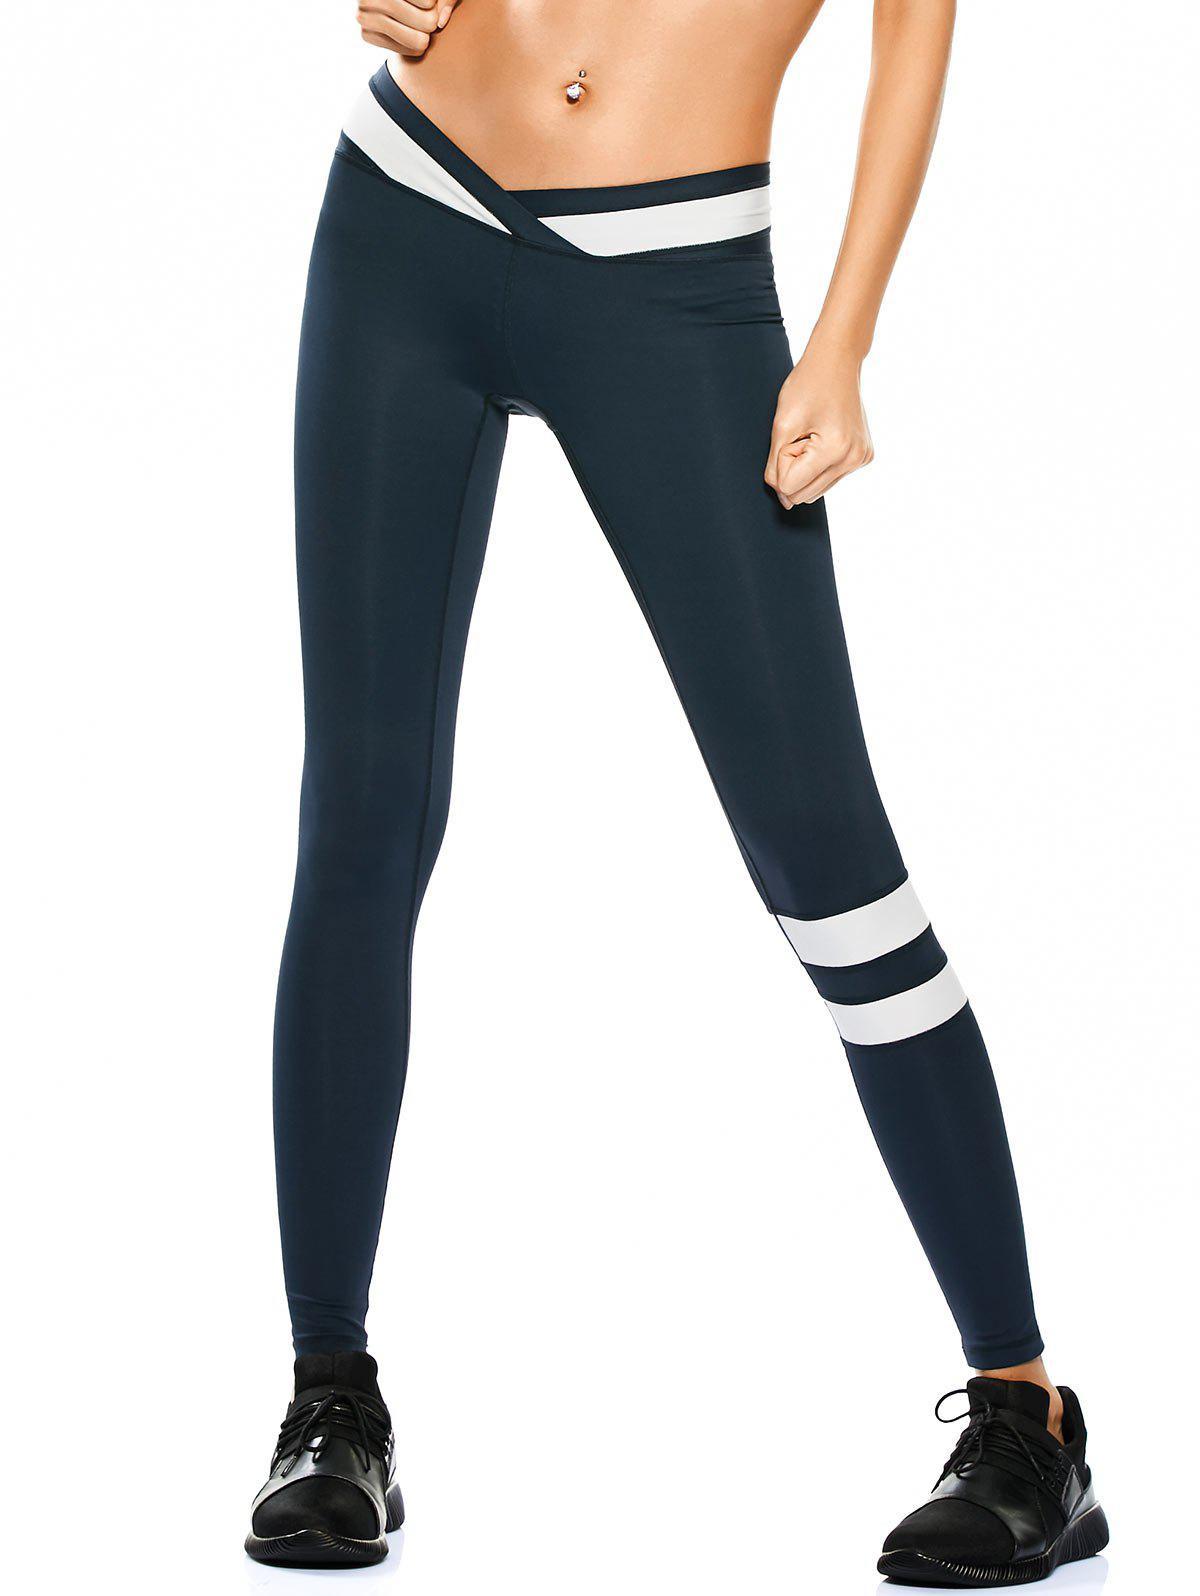 Activewear Two Tone Yoga Leggings 210926801